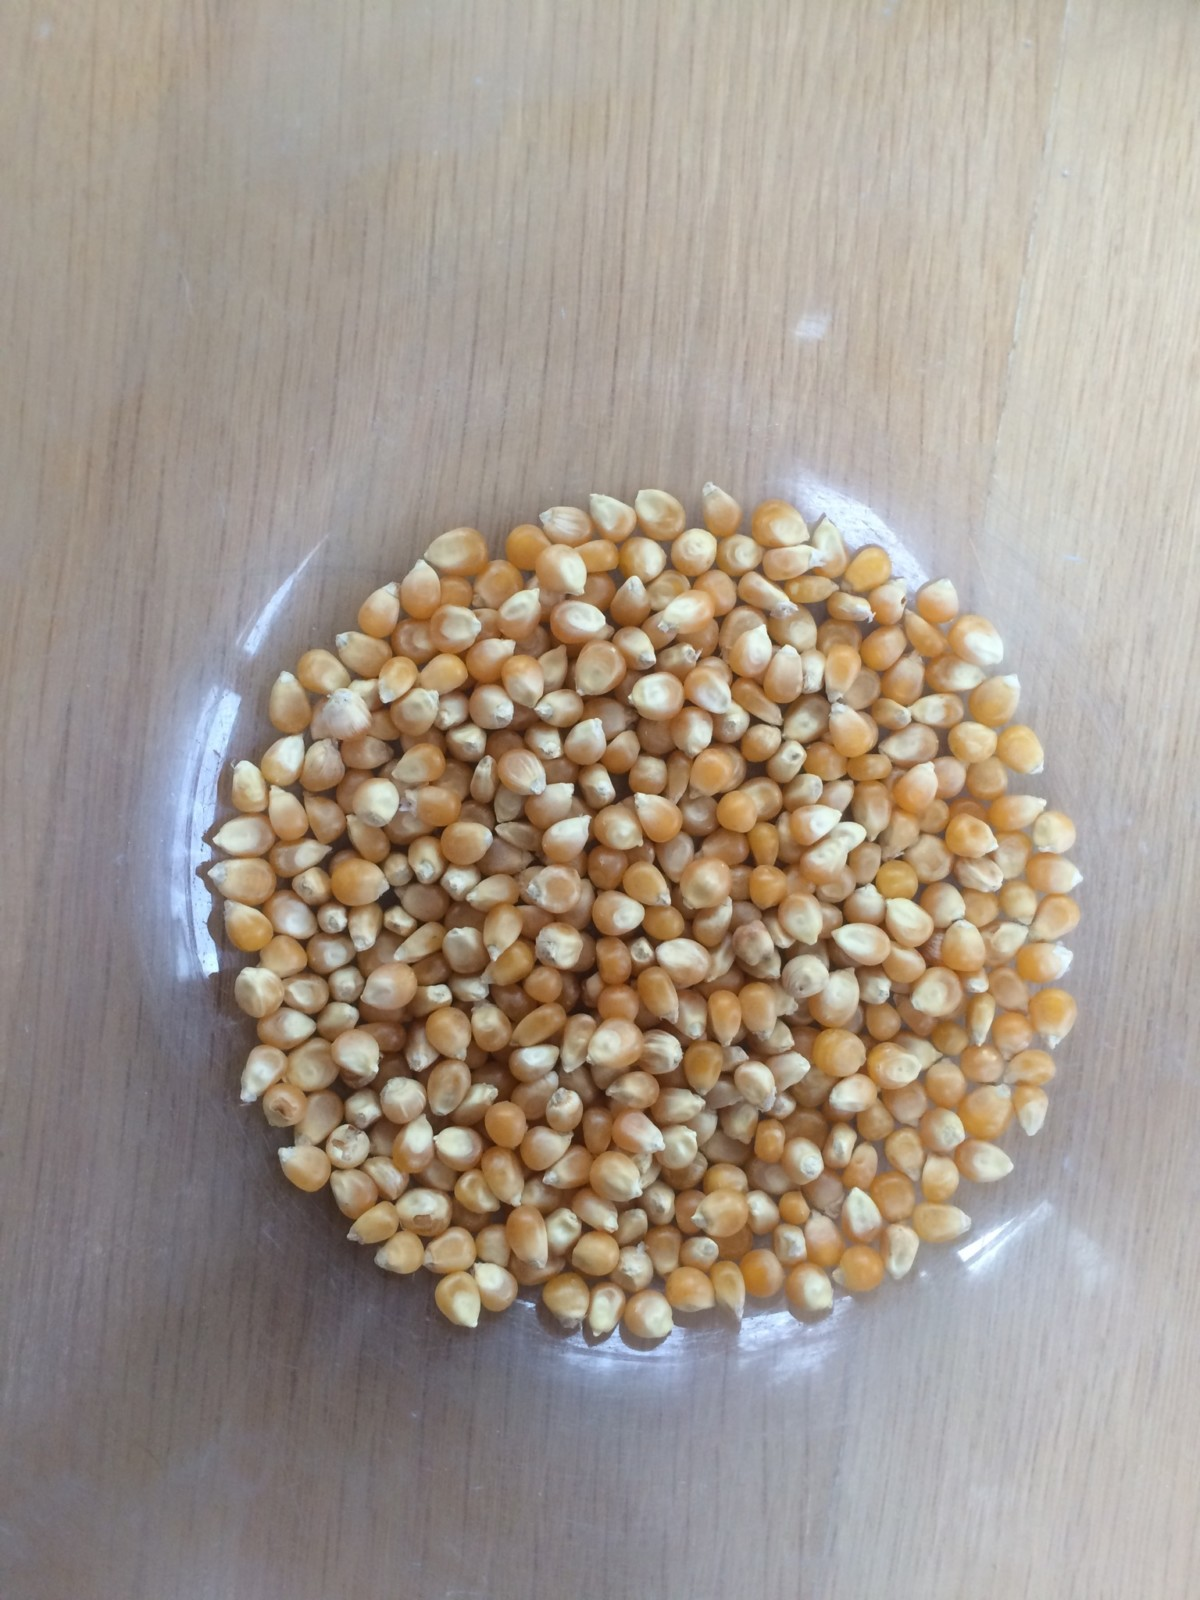 Raw popcorn